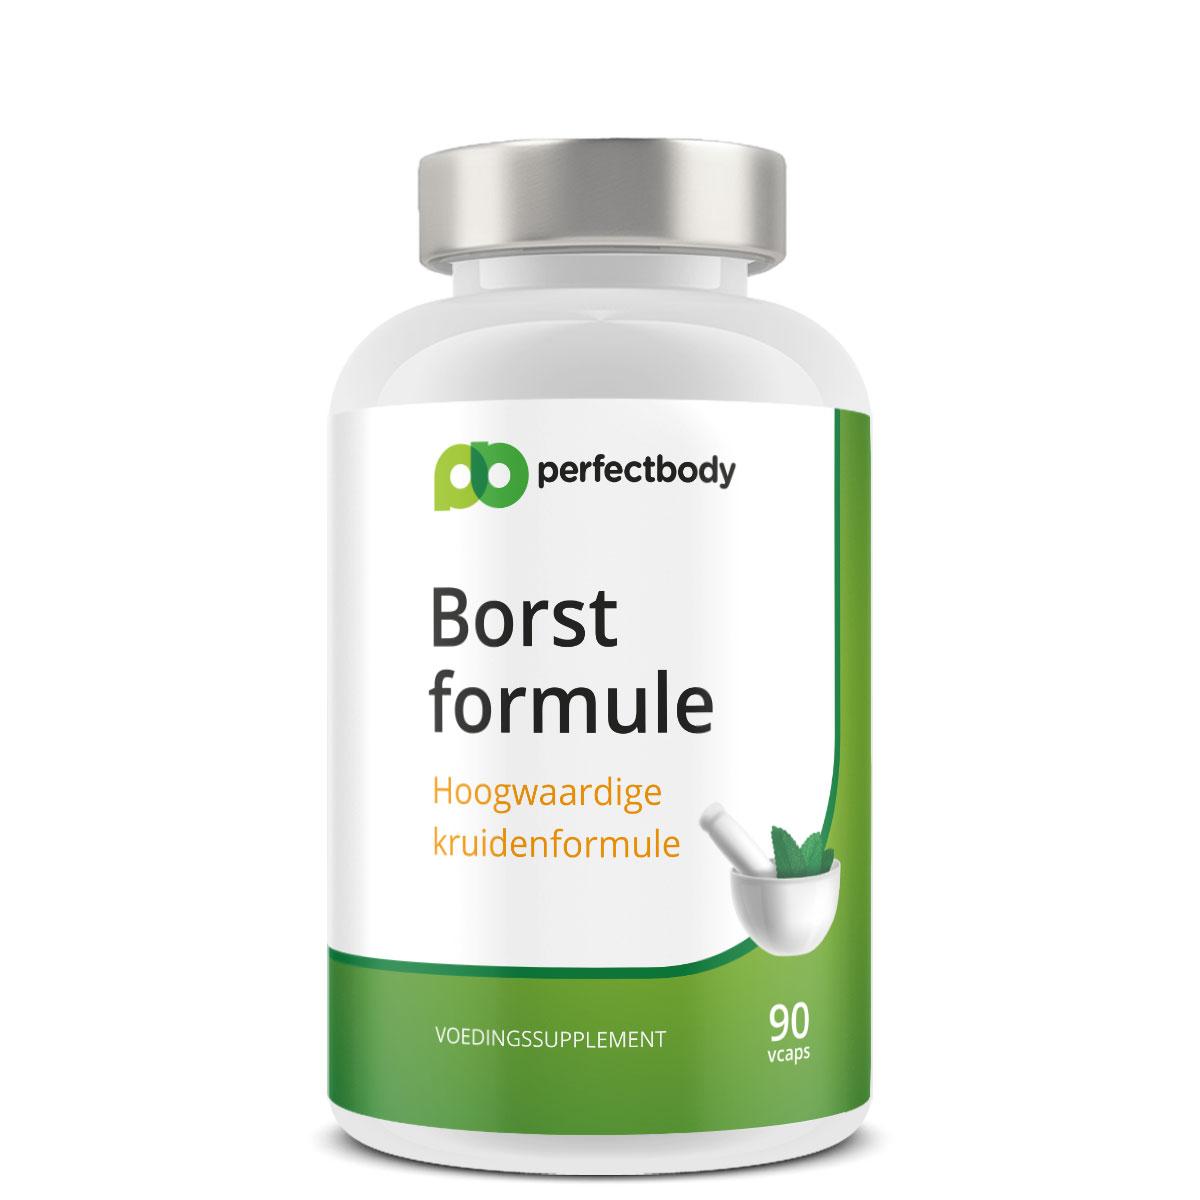 Perfectbody Borstformule - 90 Vcaps